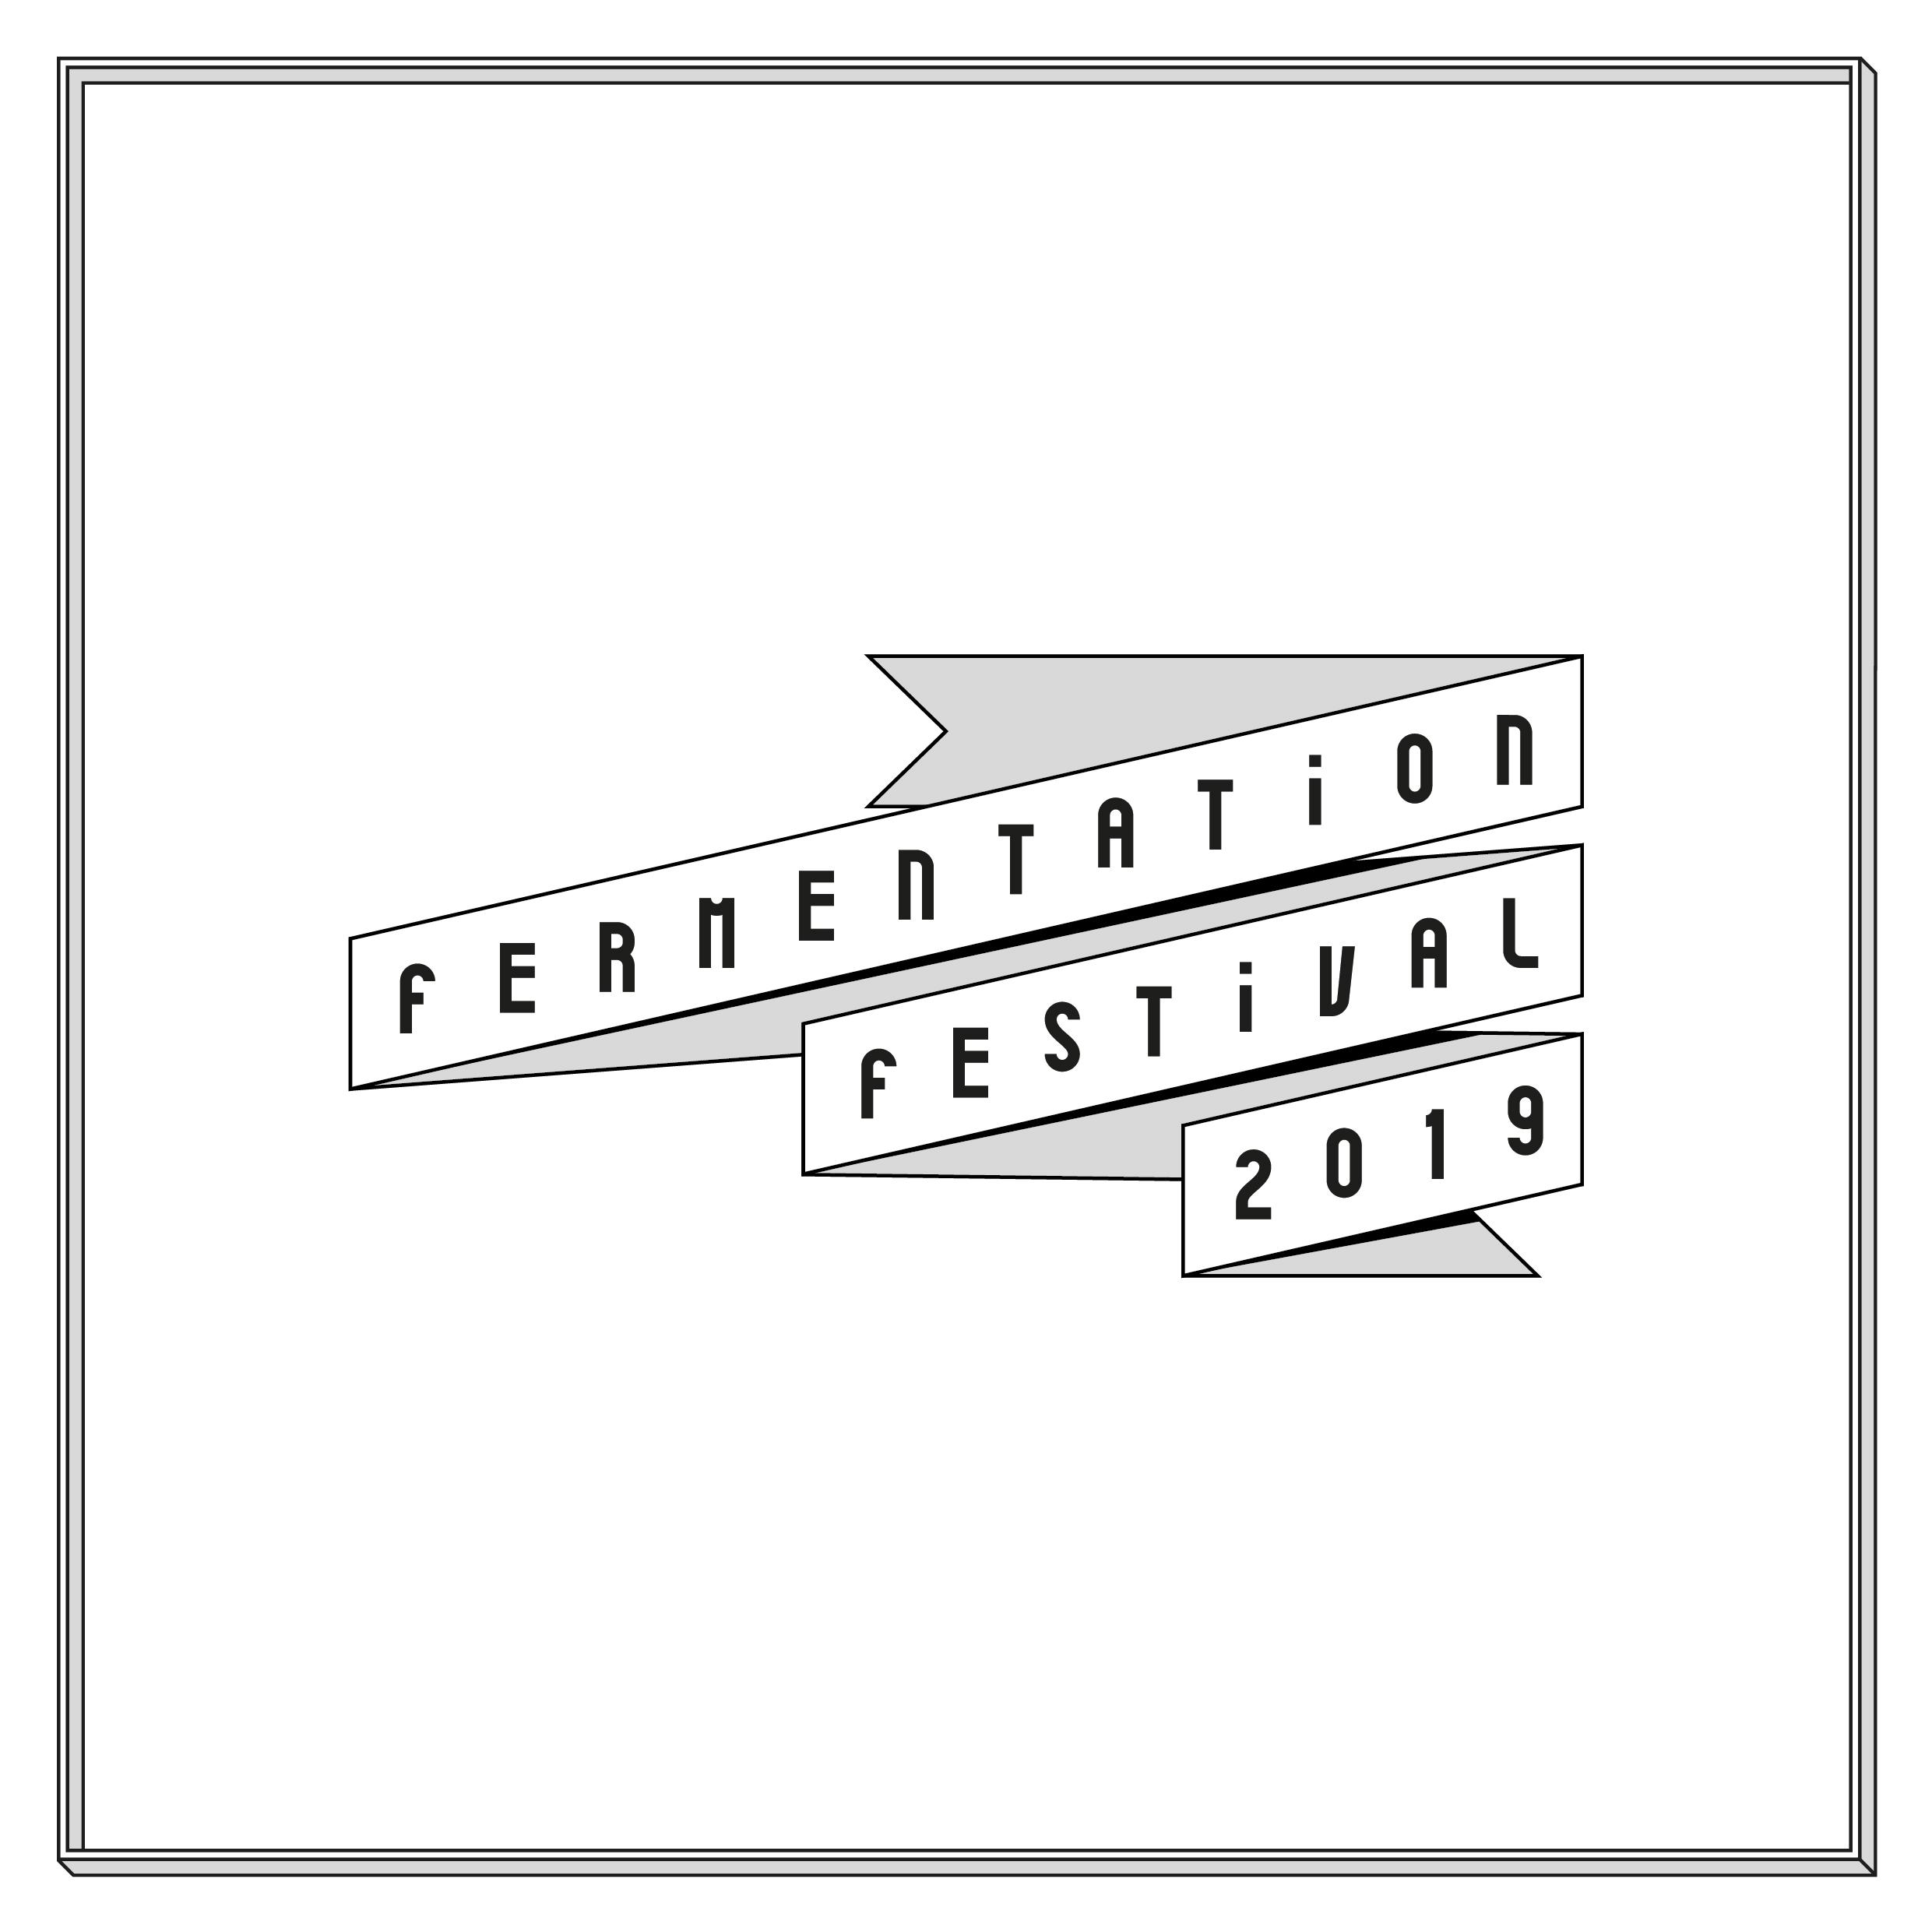 Ferm Fest Logo